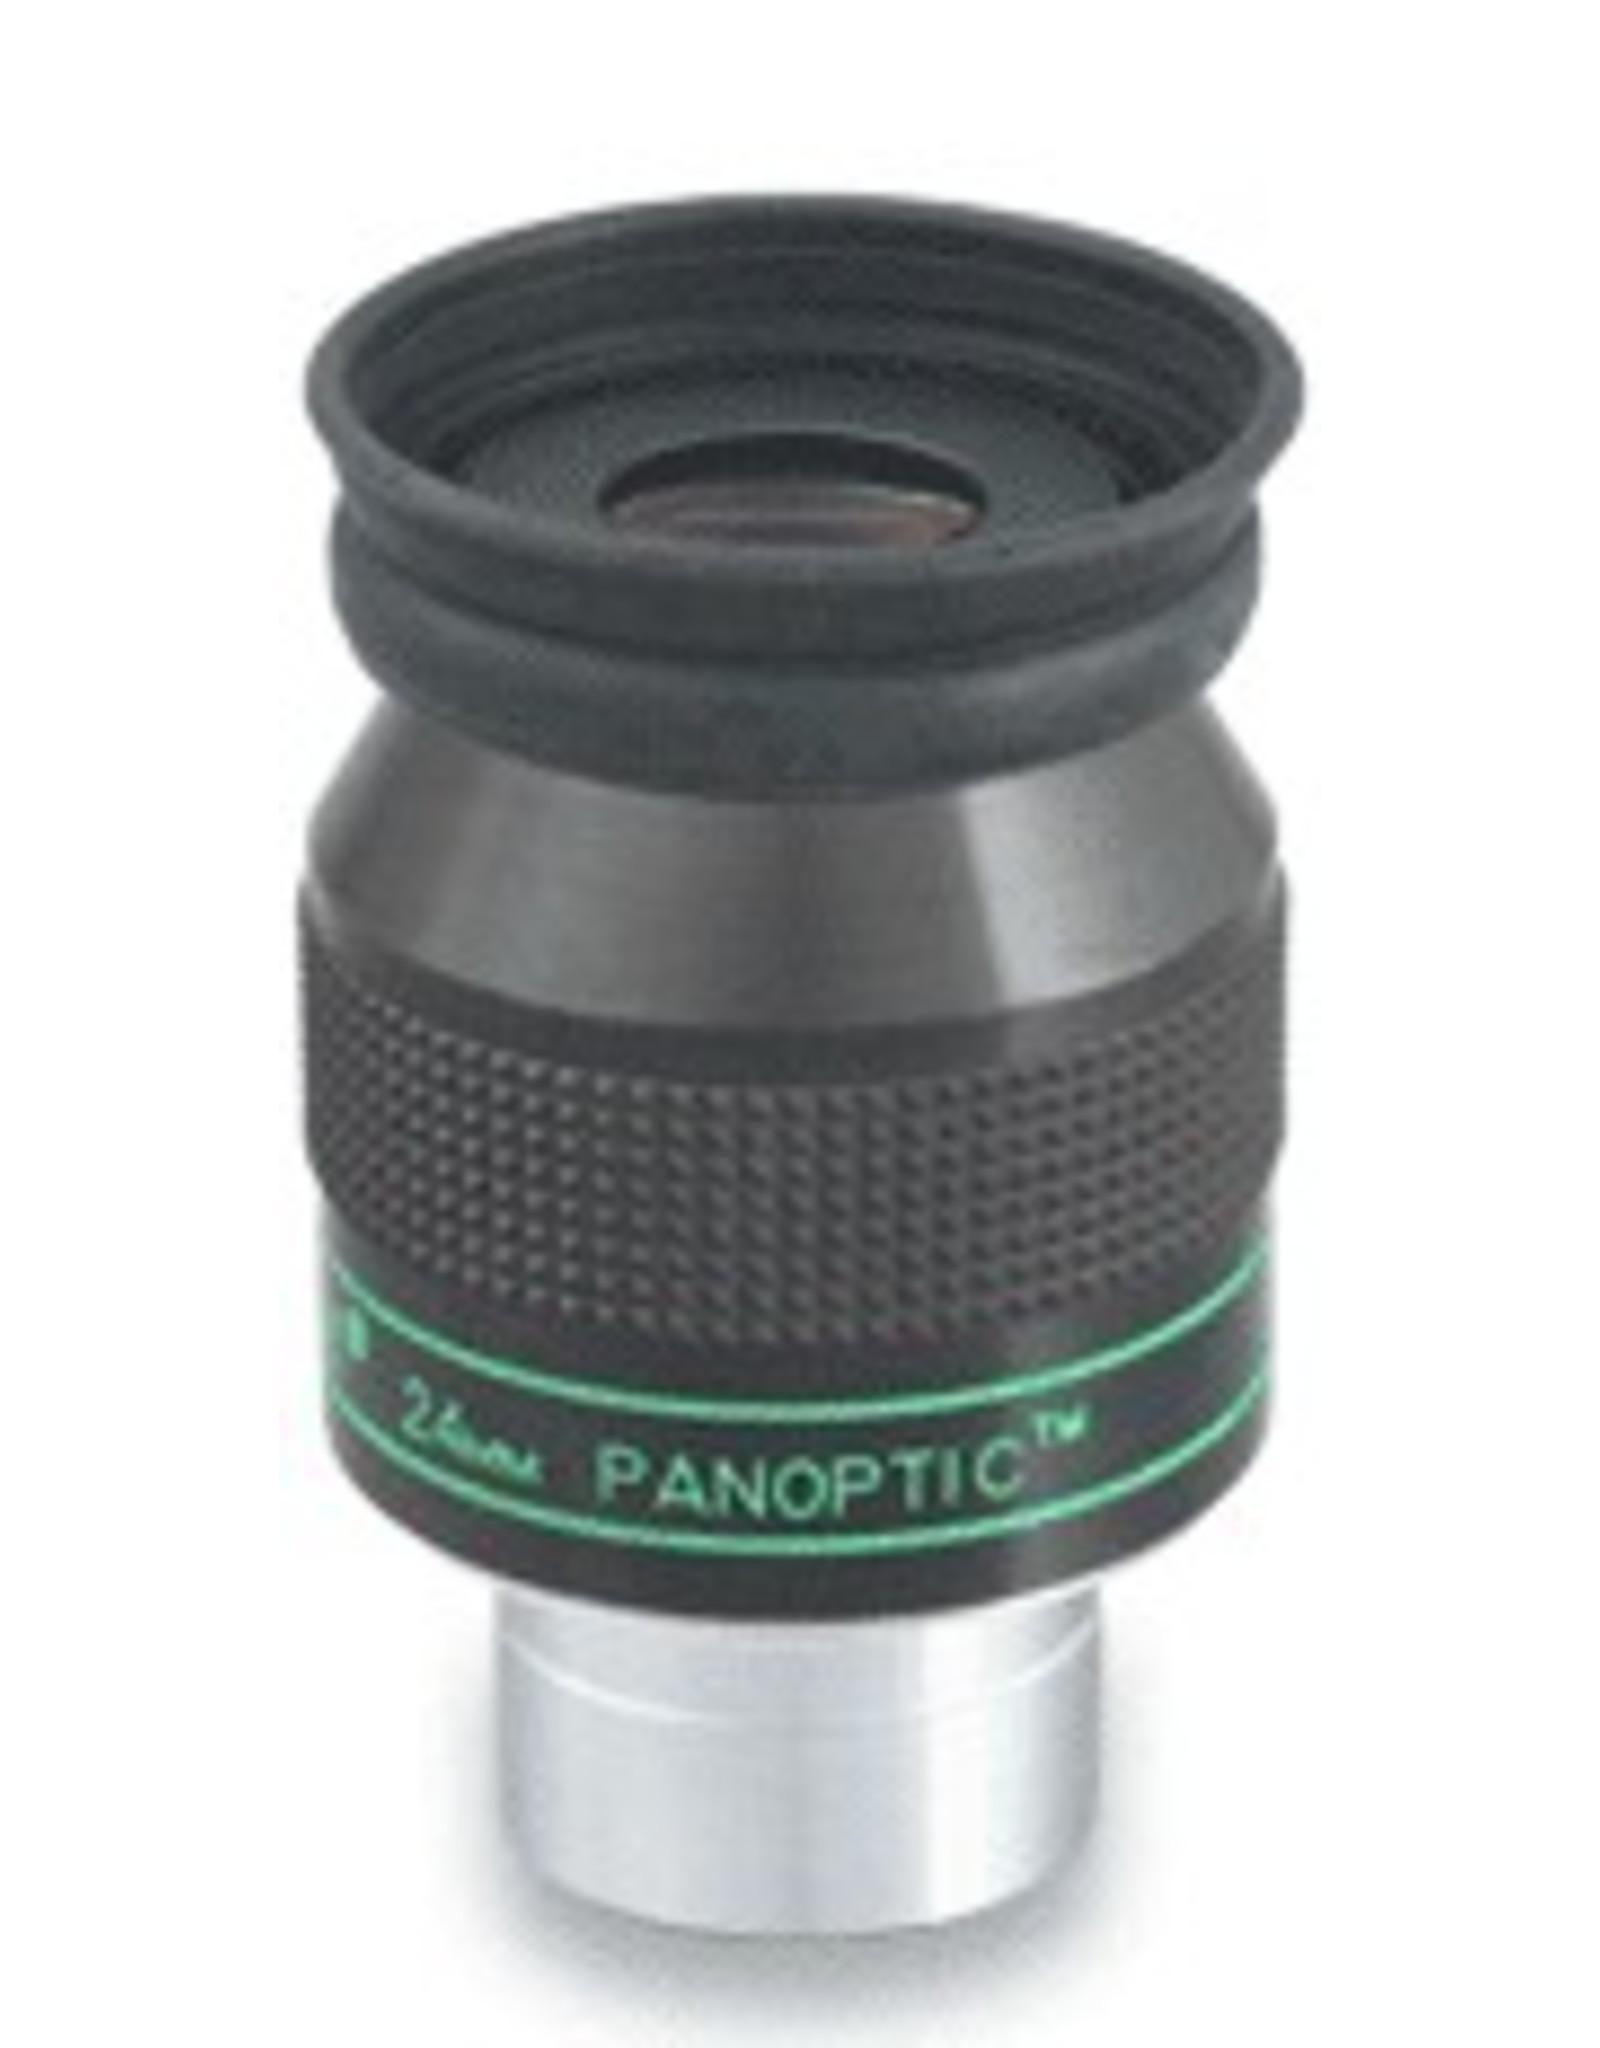 Tele vue Dioptrx Adapter - Panoptic - DEA-0001